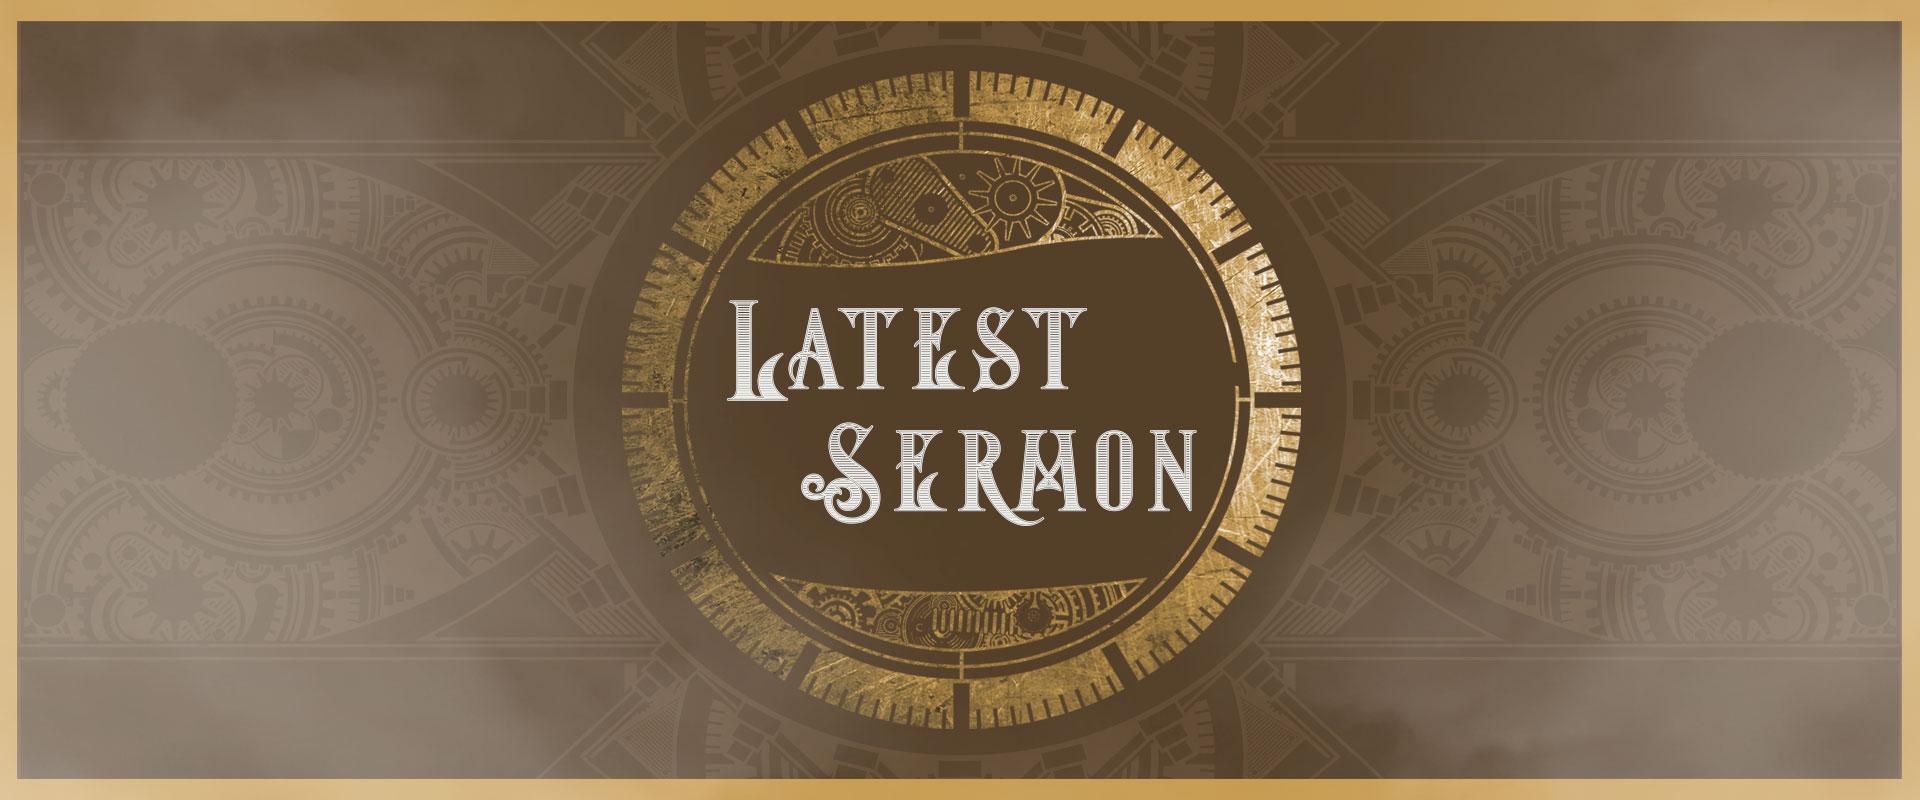 latest sermon built for action